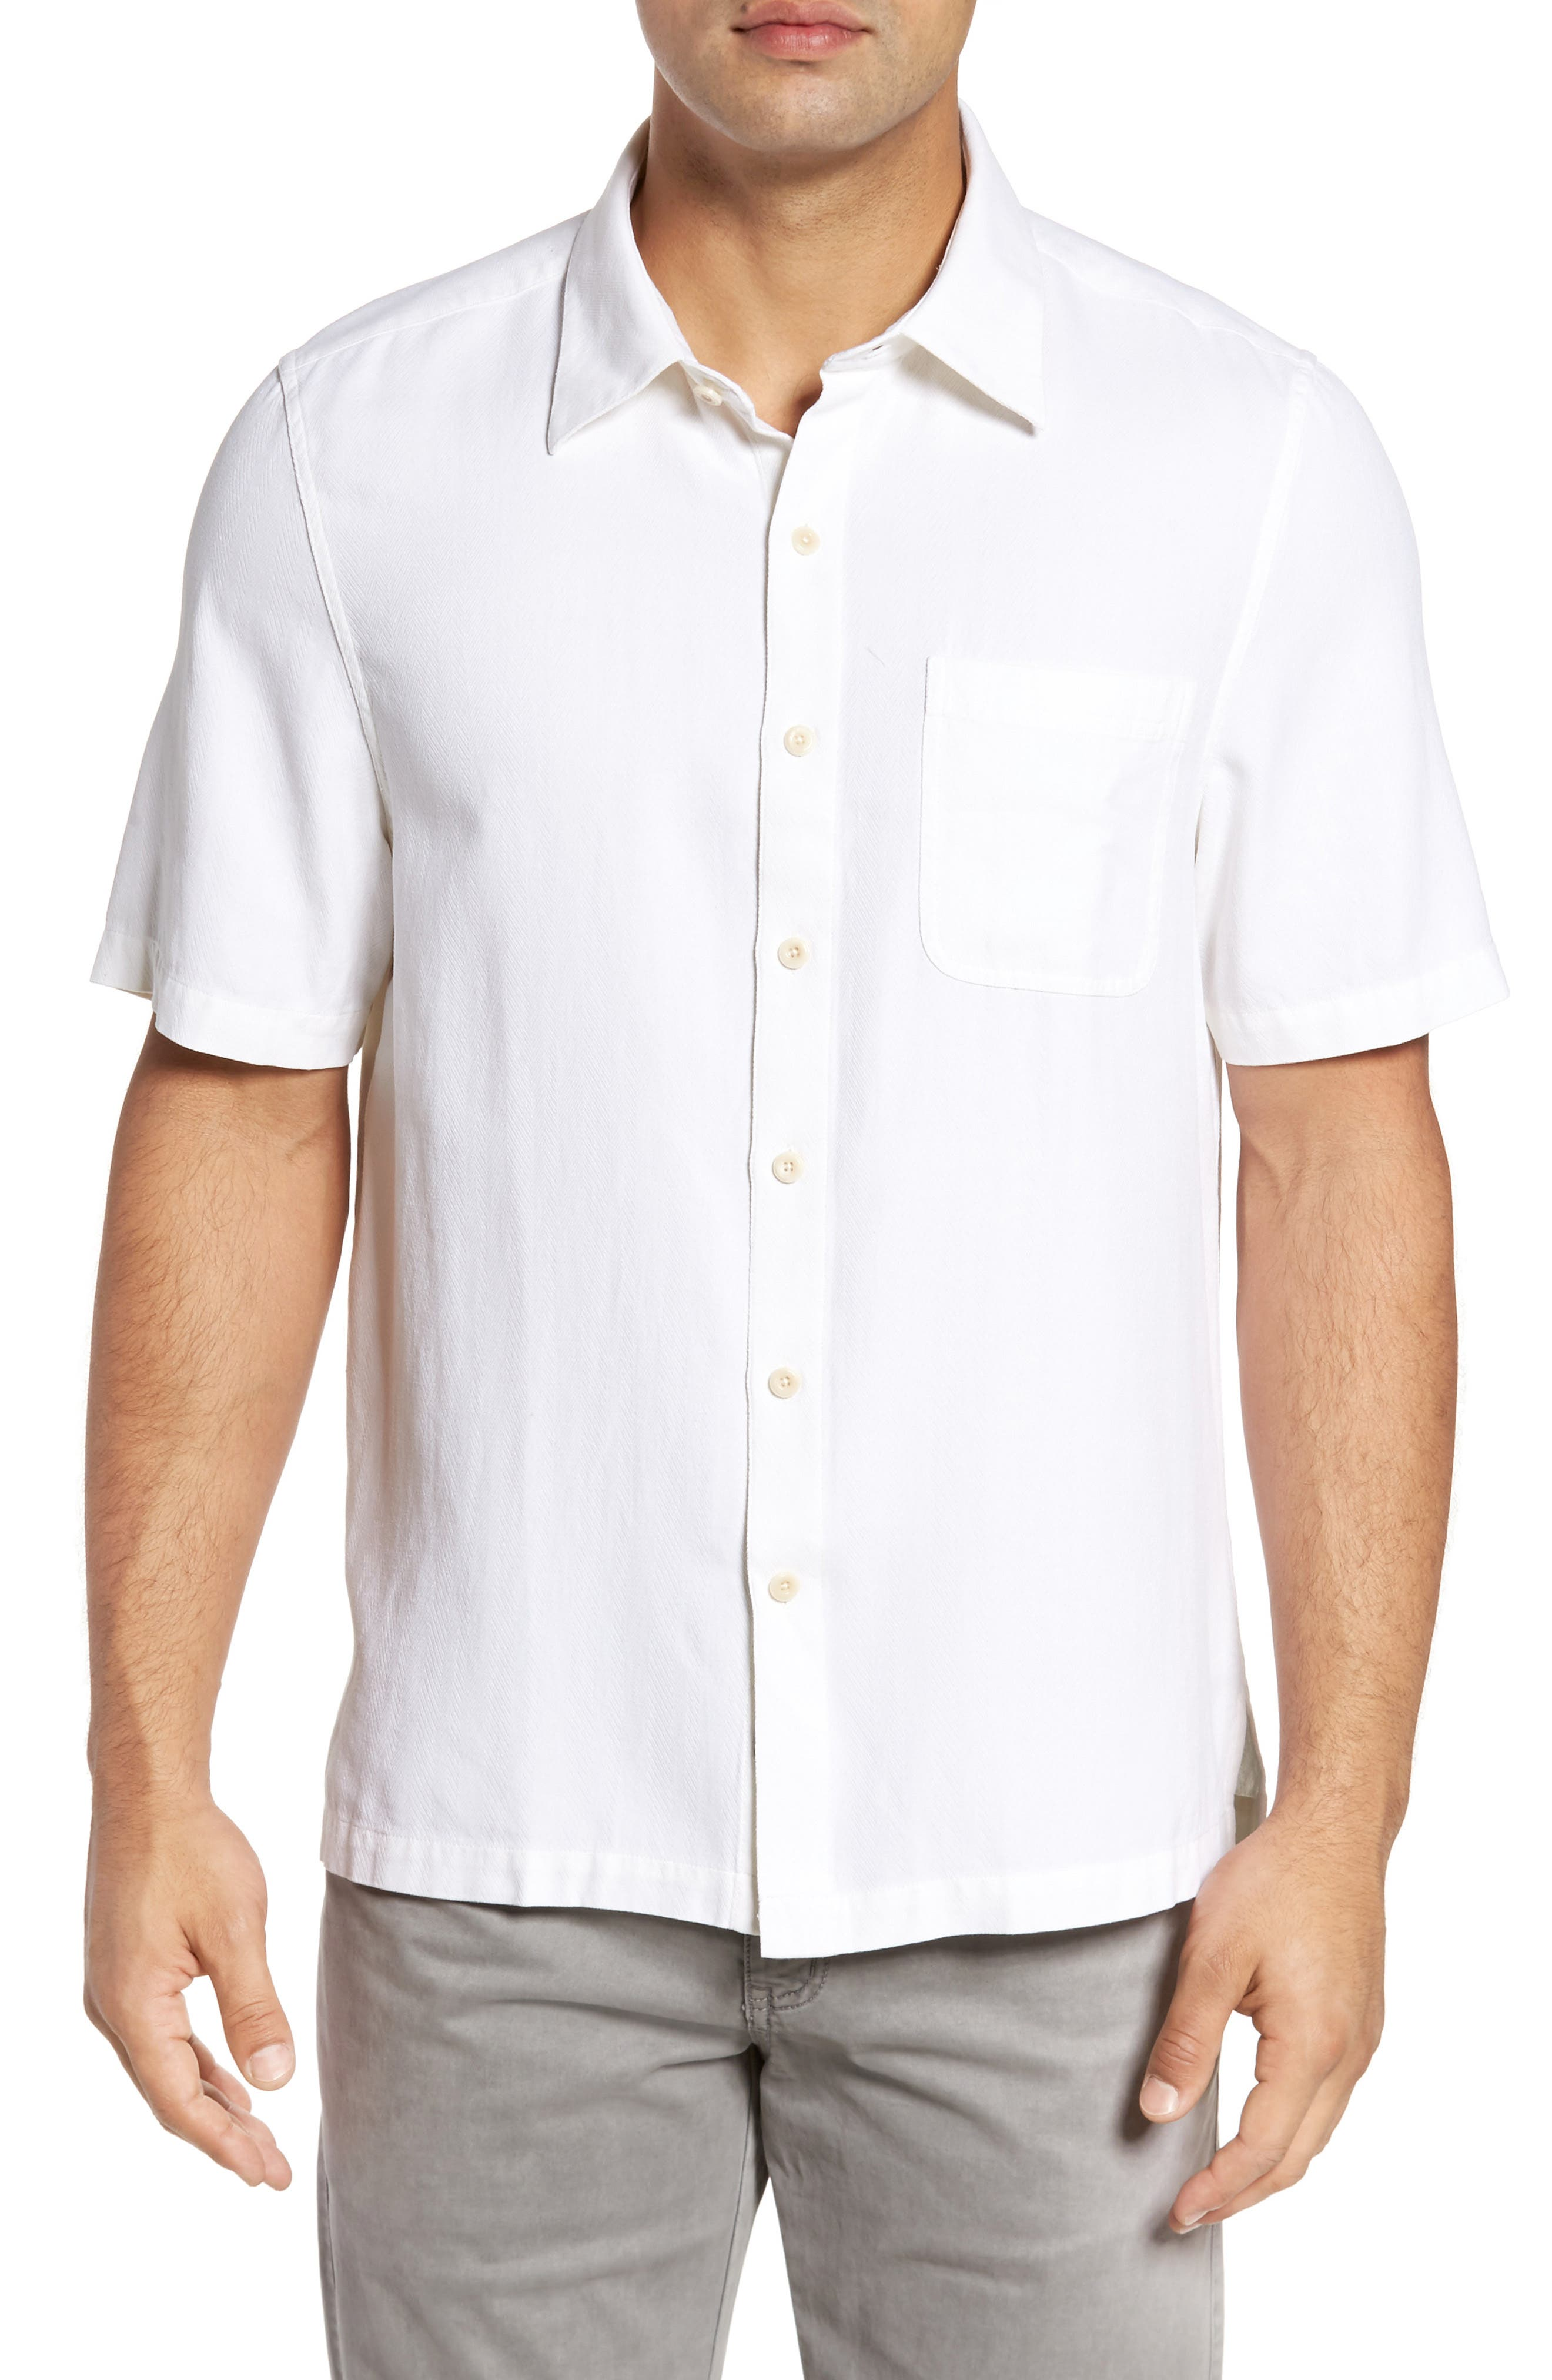 Main Image - Nat Nast With a Twist Silk Blend Camp Shirt